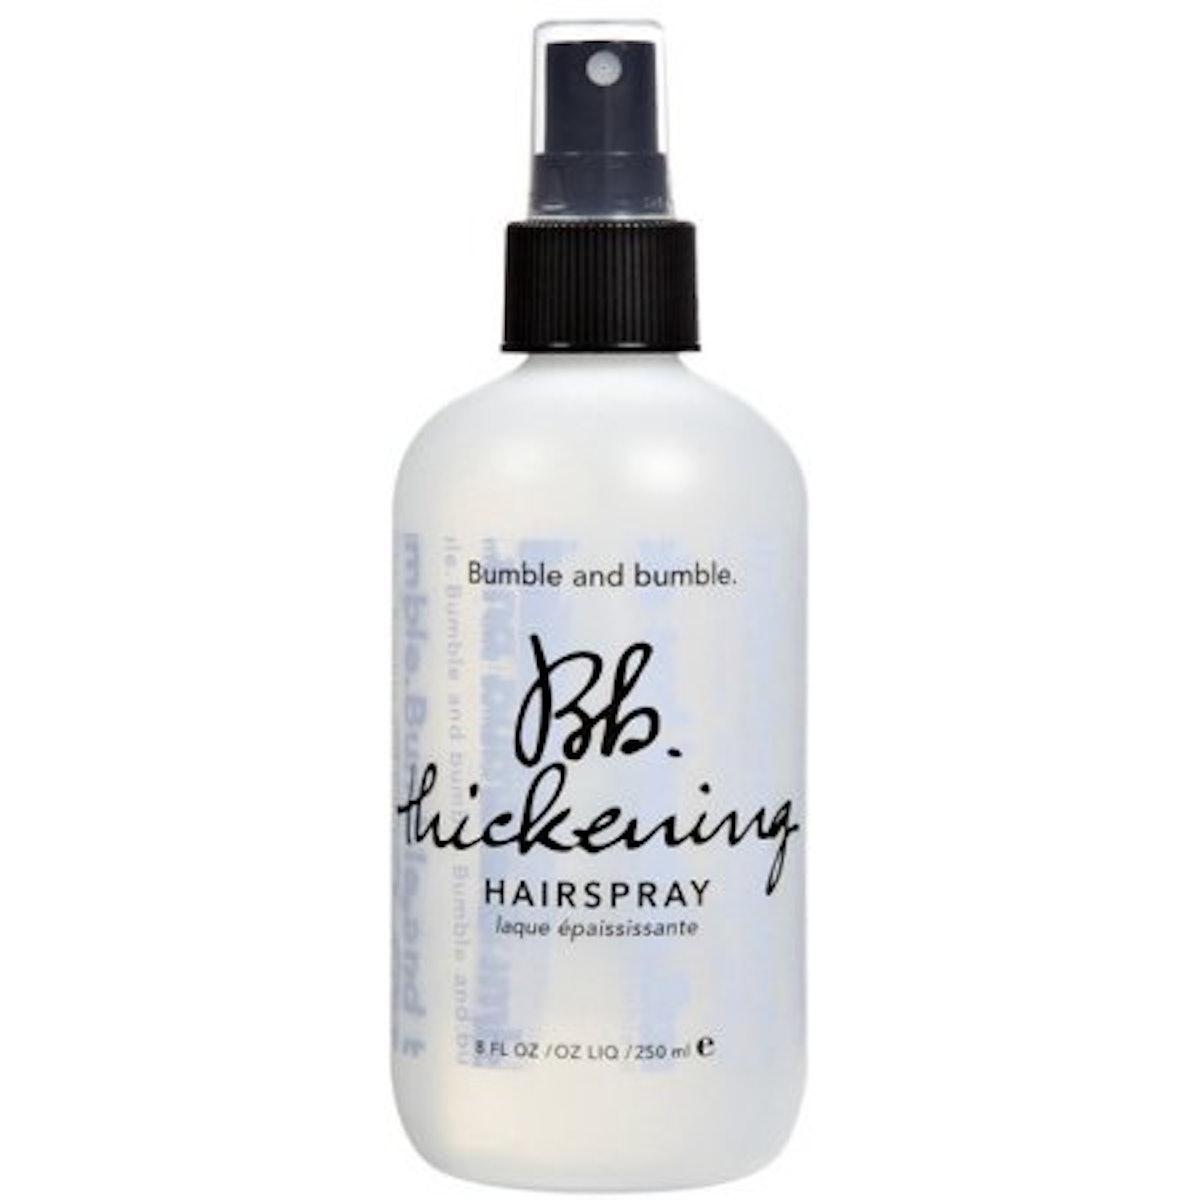 Thickening Volume Hairspray